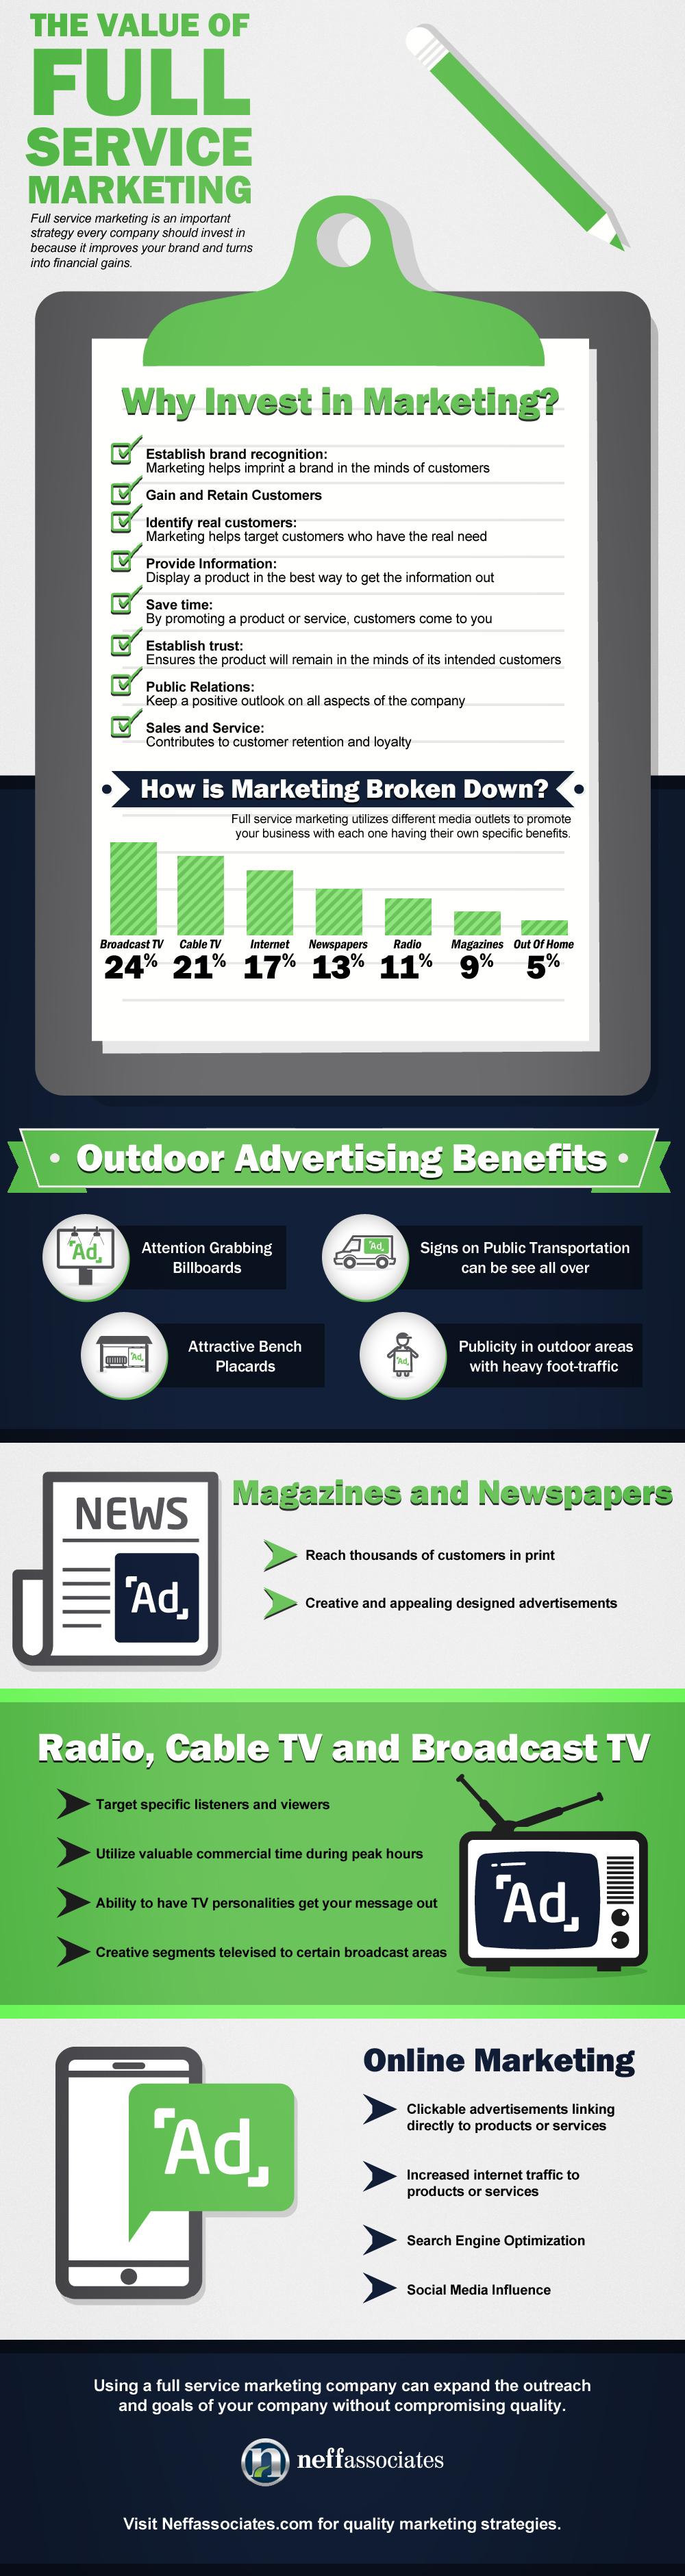 Value of Full Service Marketing